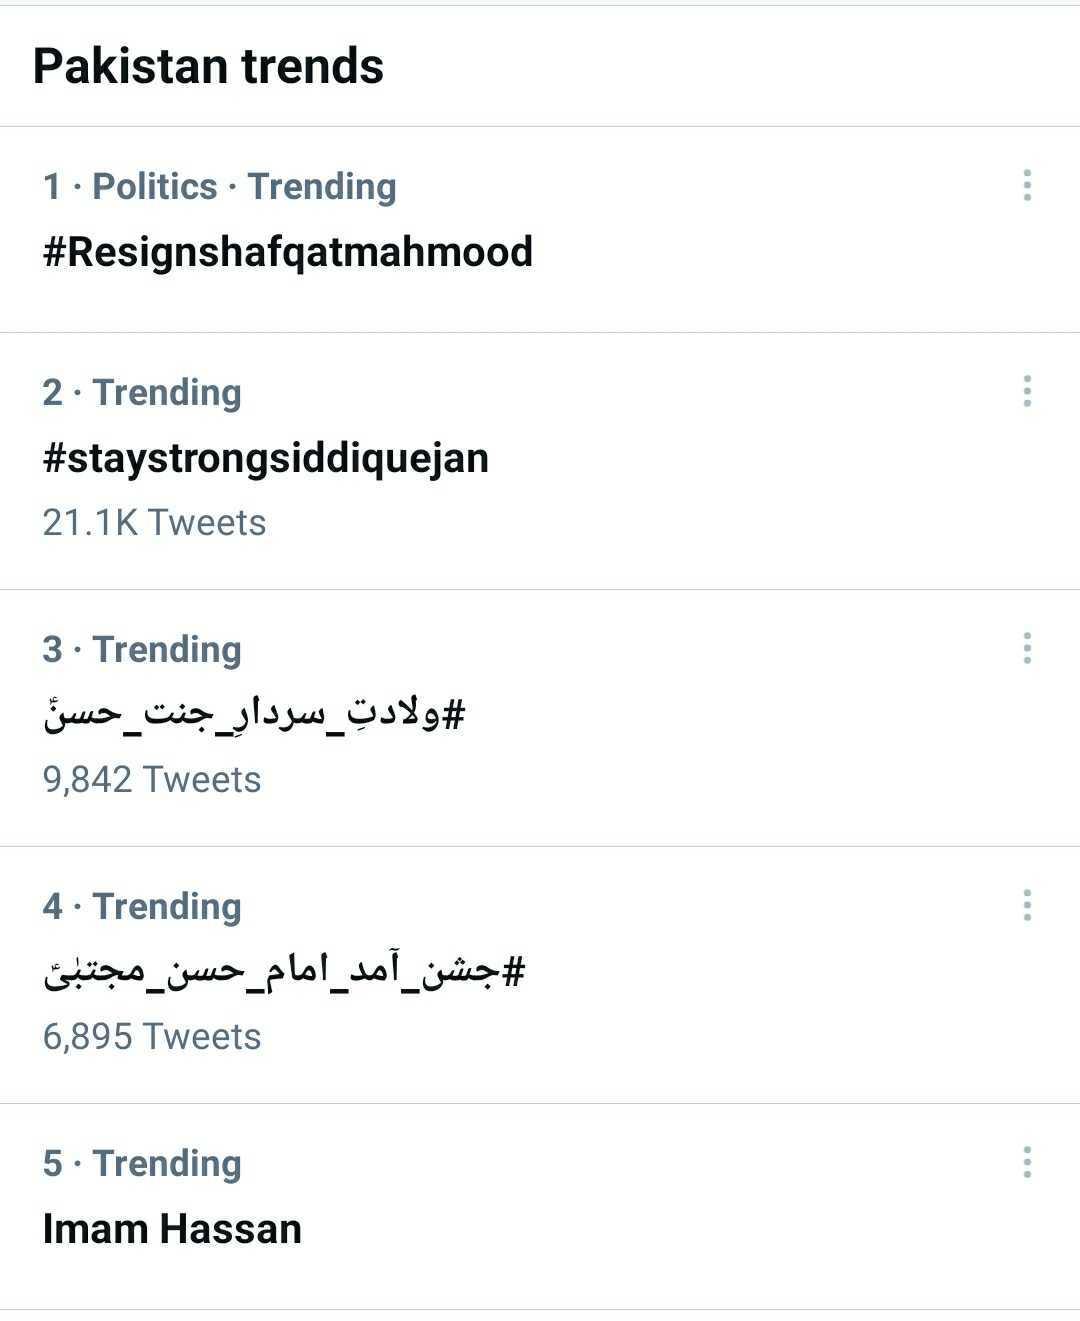 shafqat mahmood resign trending